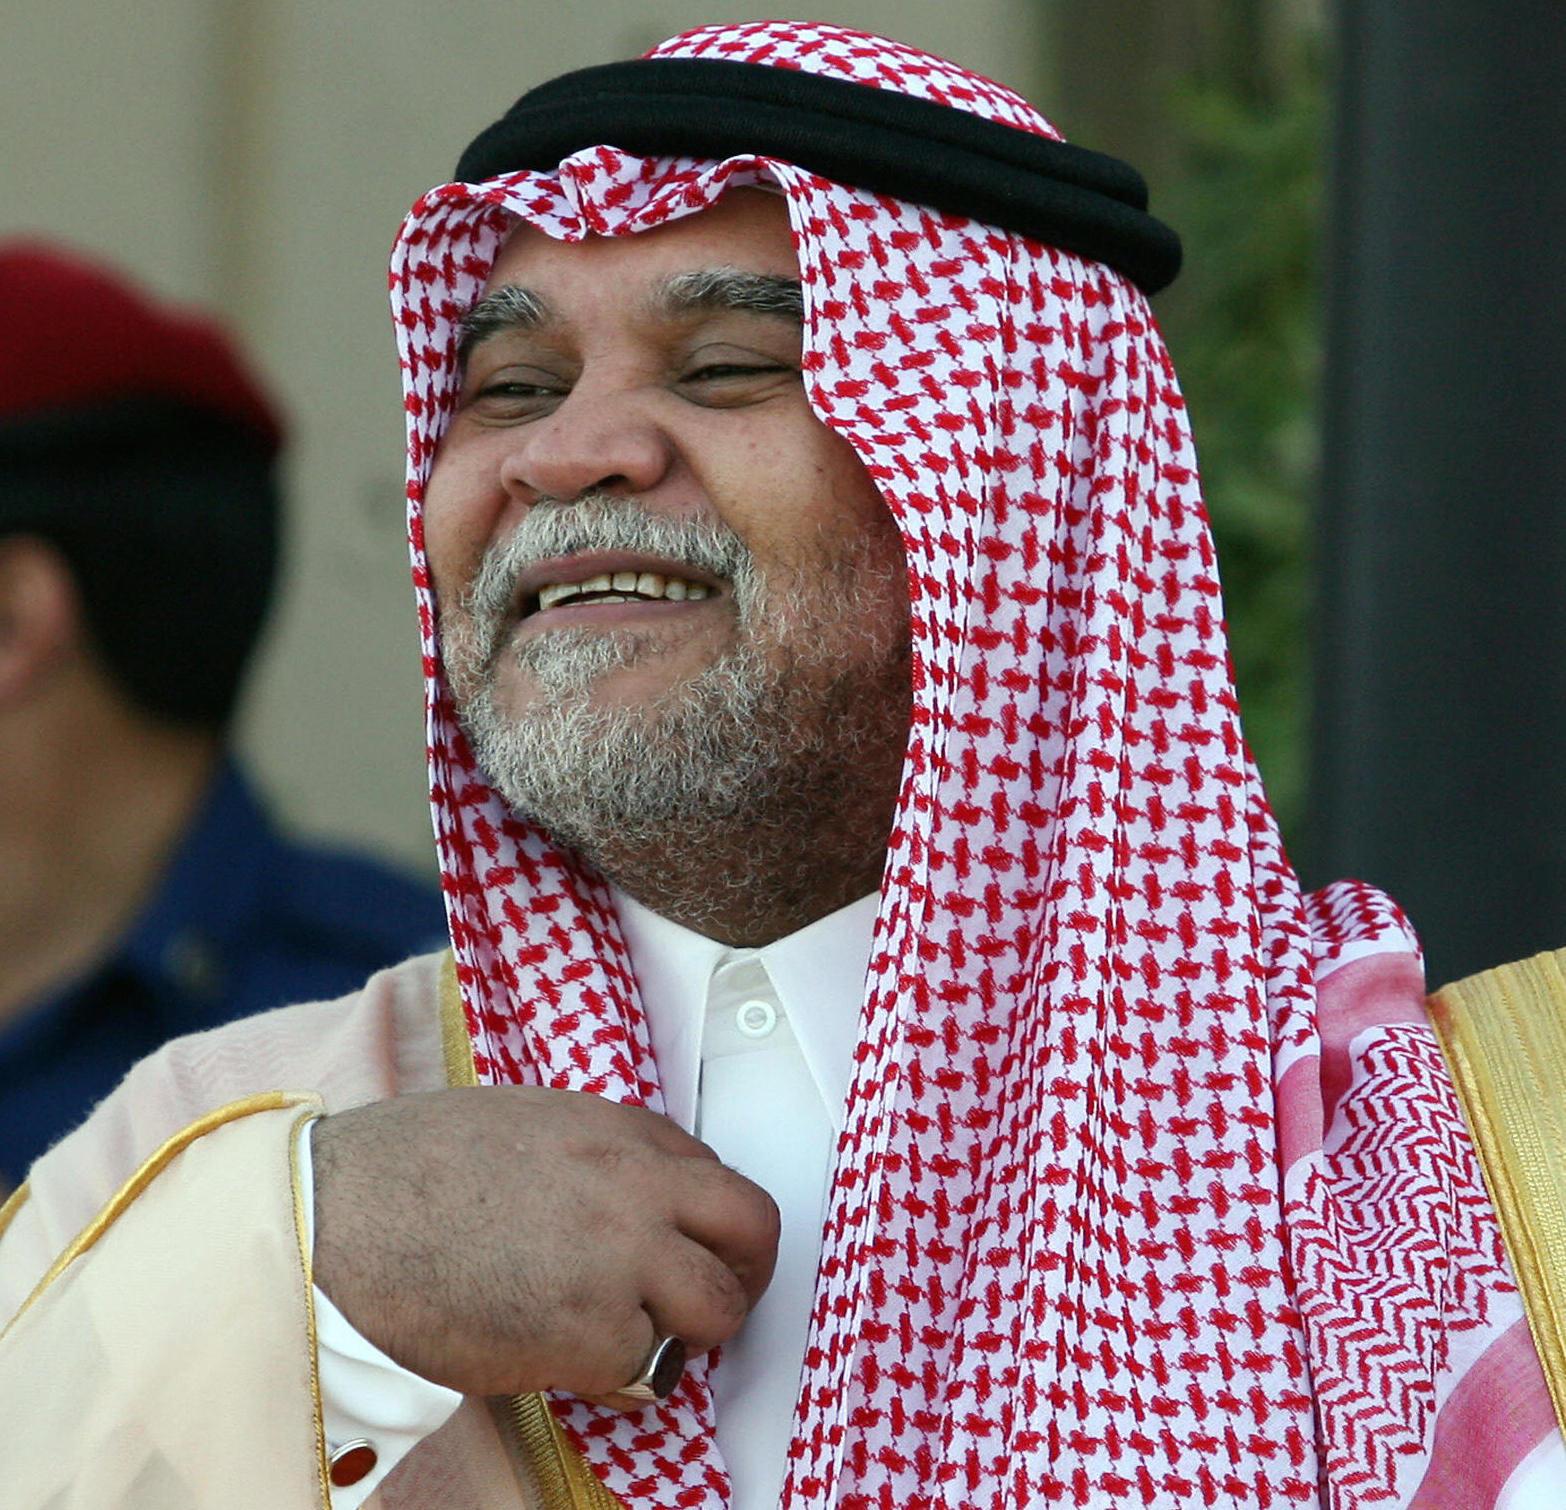 Bandar bin Sultan HASSAN AMMAR/AFP/Getty Images